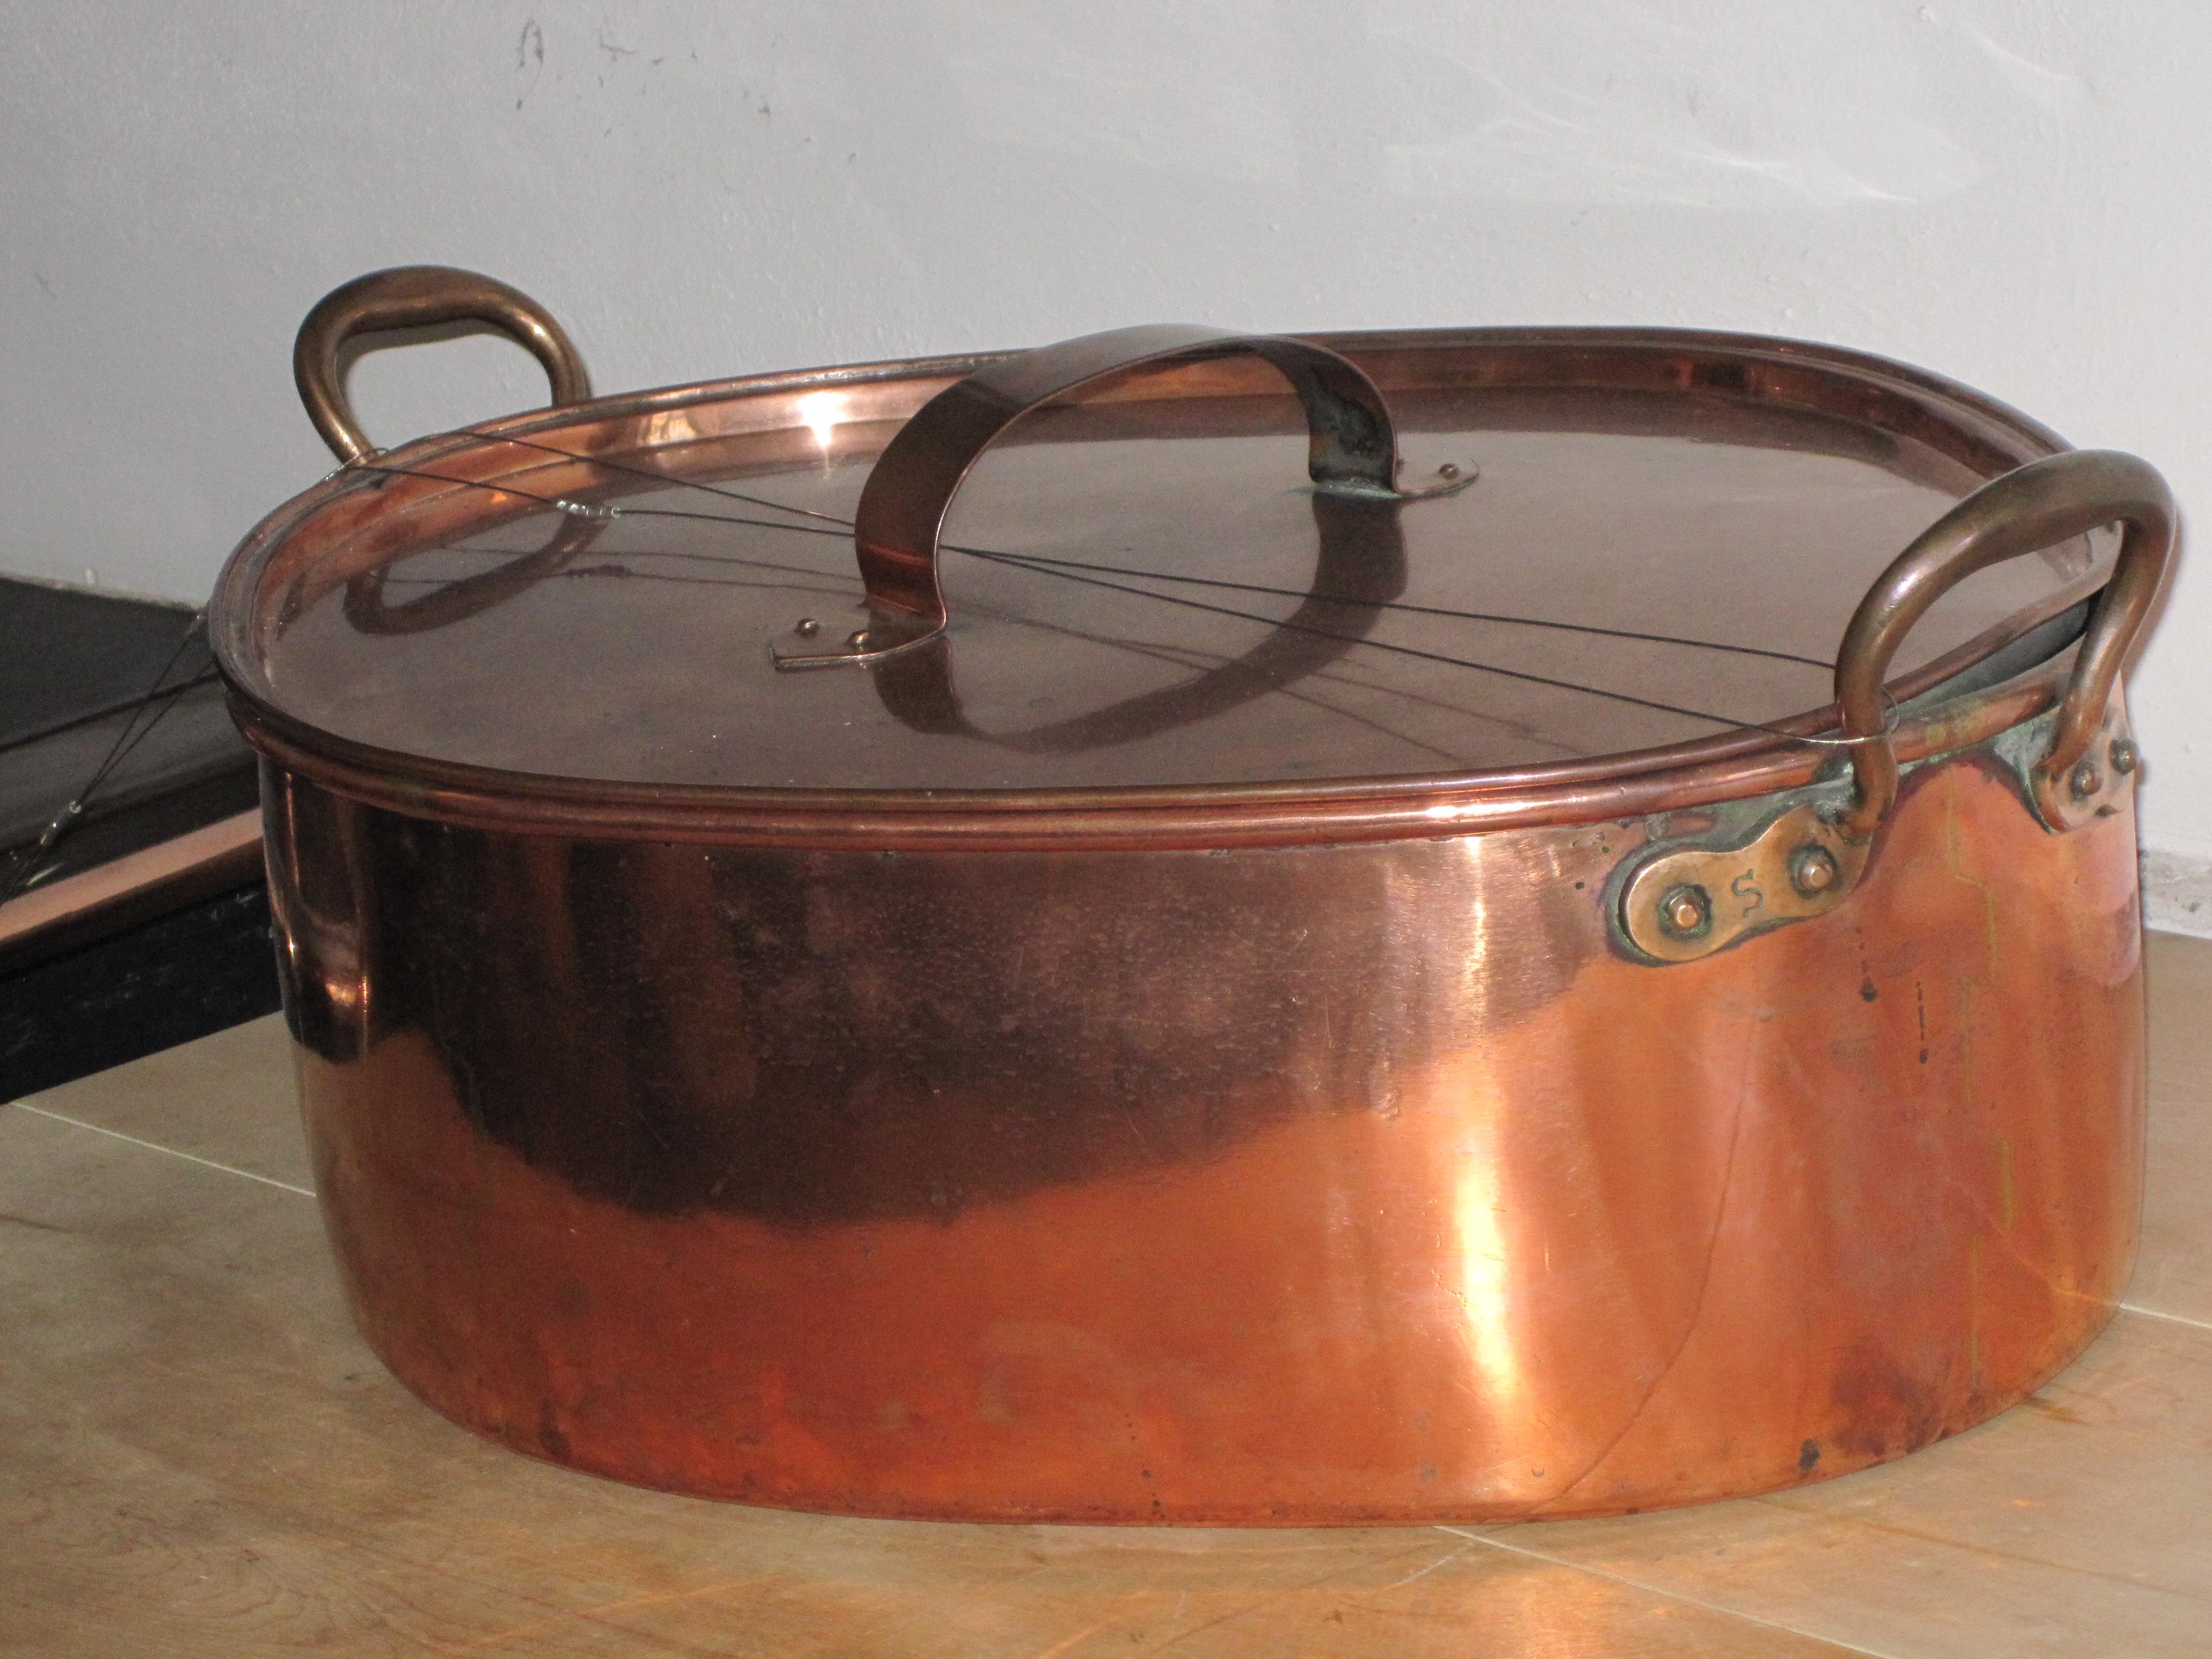 Copper Pots In A Castle